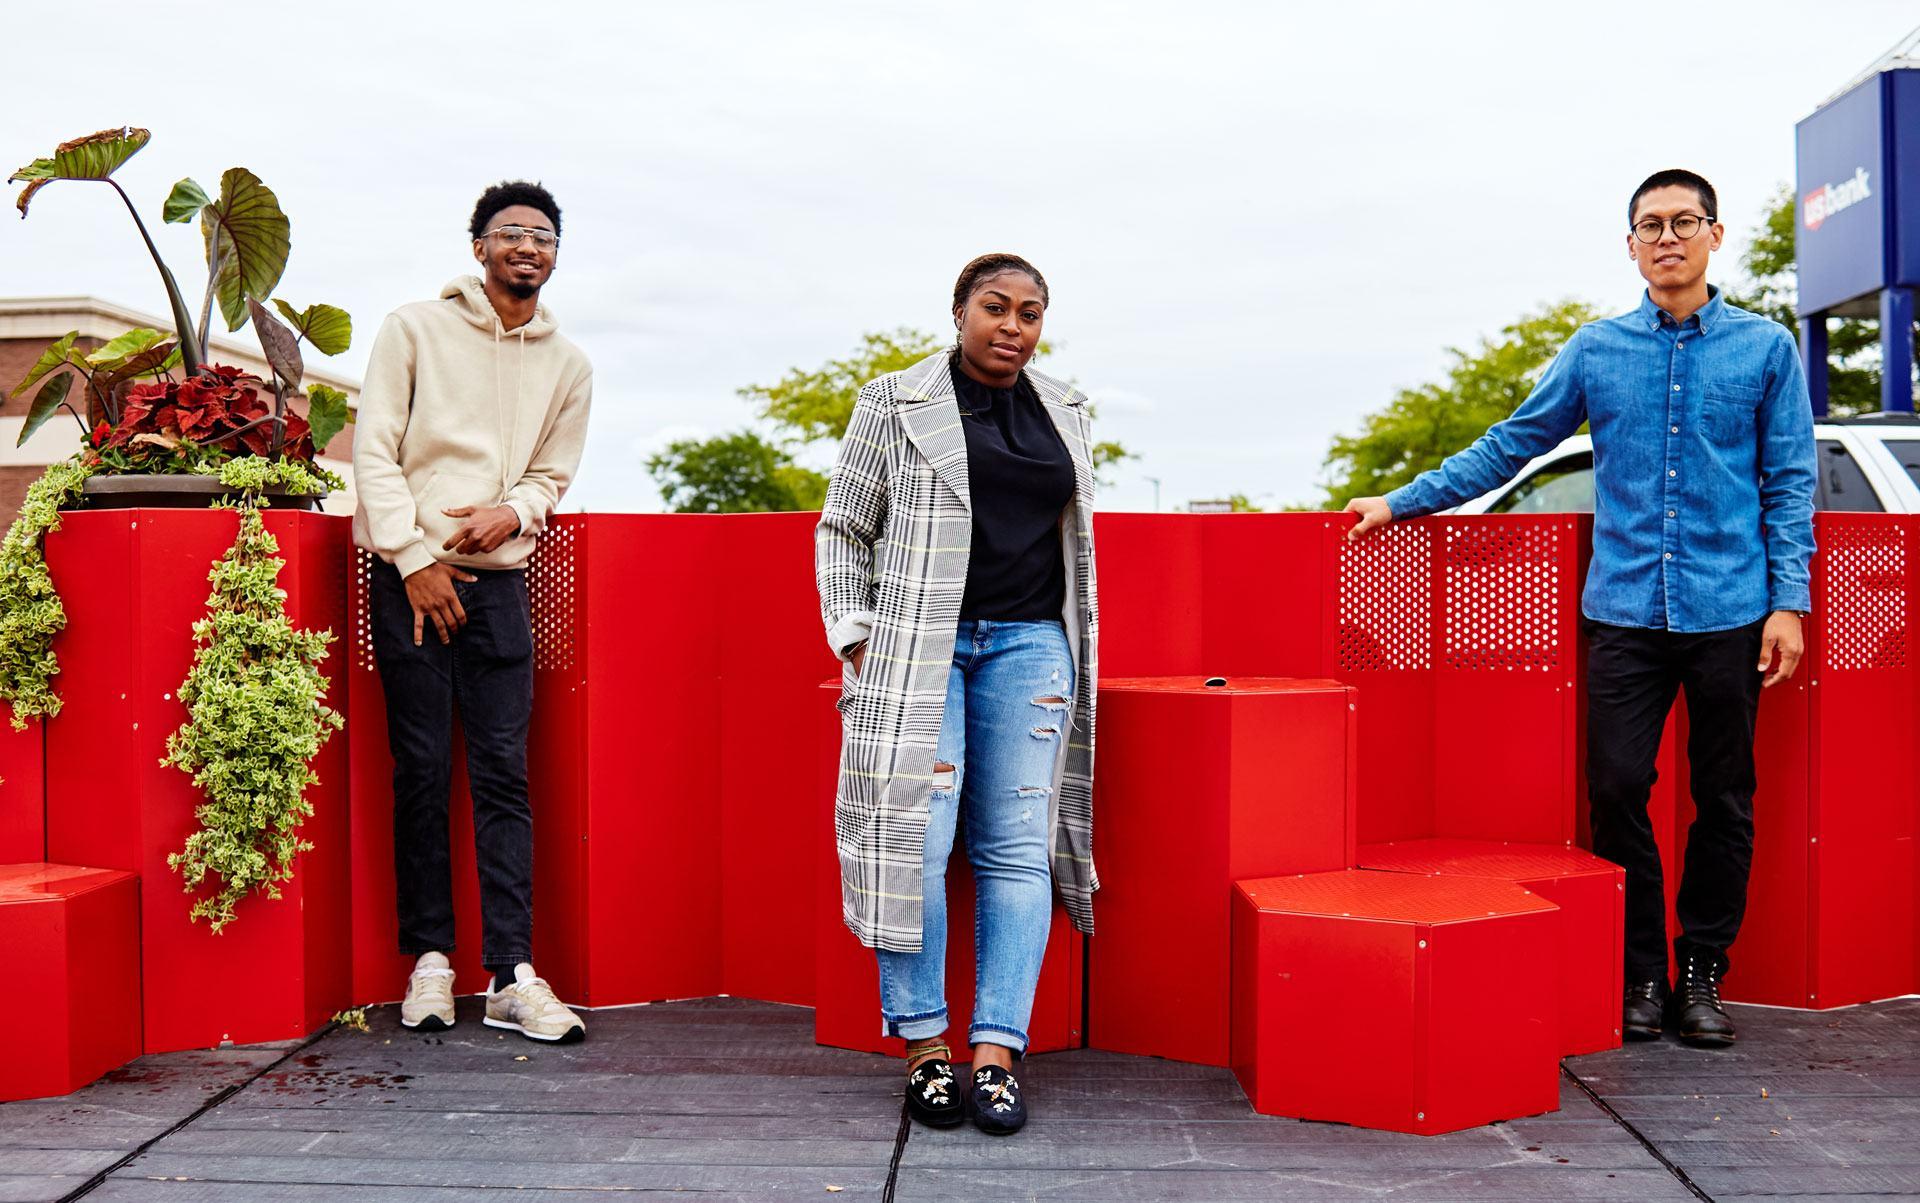 Qadiym Washington, Gabrielle Grier, and Niko Kubota pose in front of the HEXTRA parklet